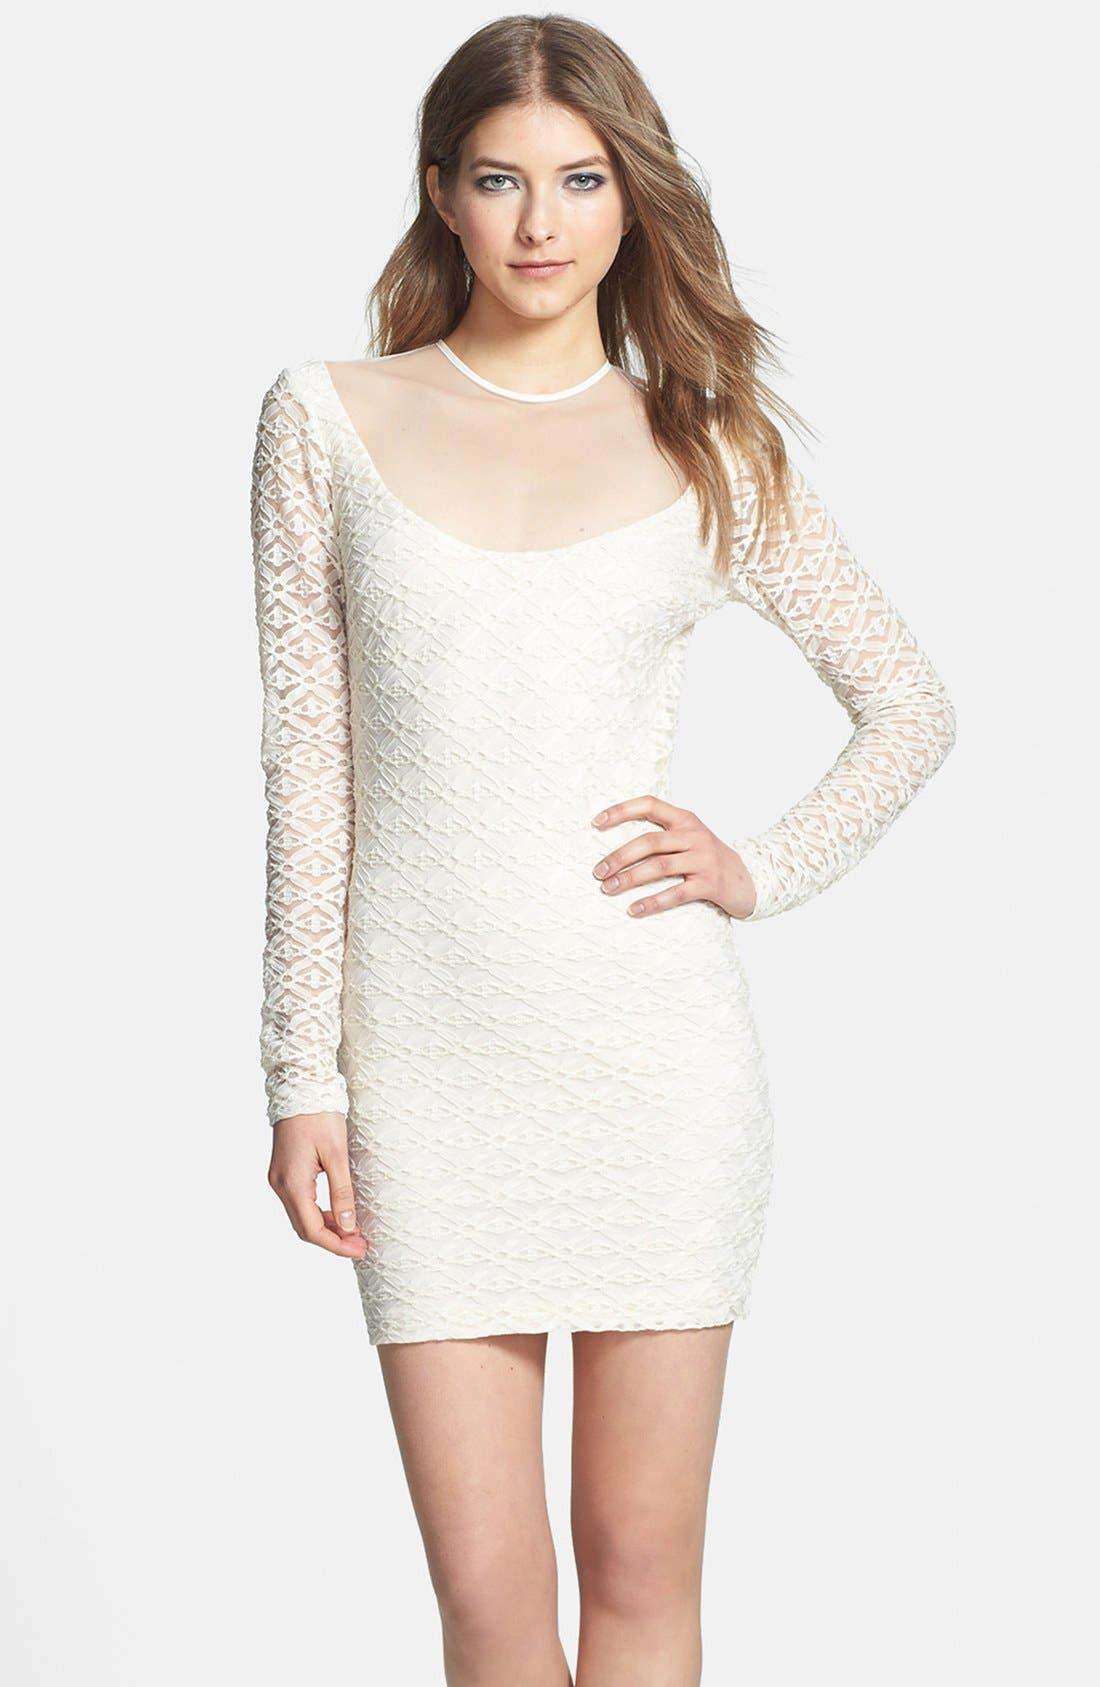 Main Image - Dress the Population 'Jessica' Textured Metallic Body-Con Dress